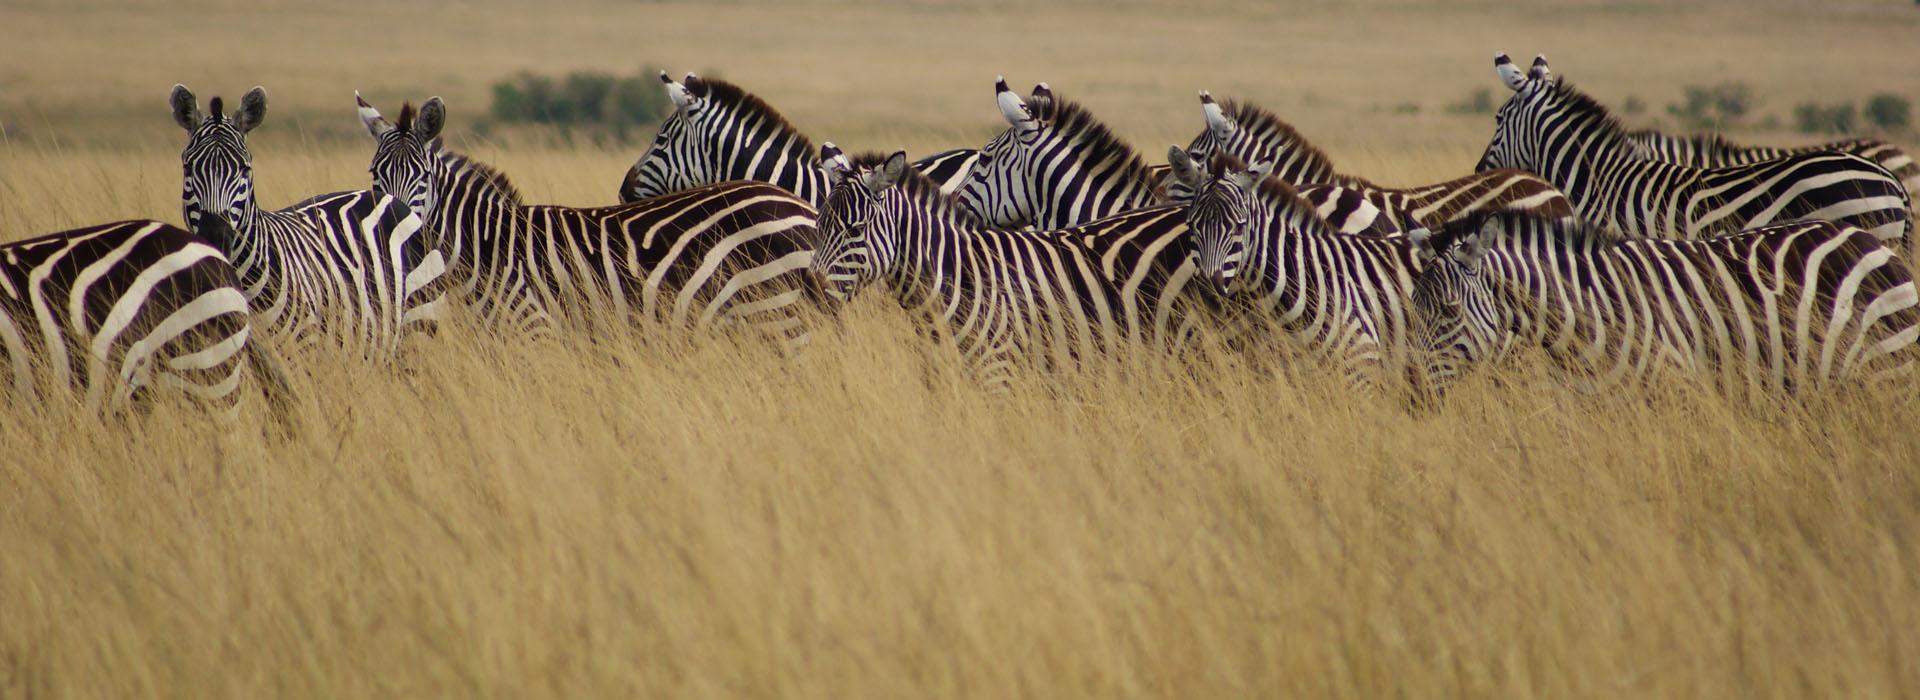 African Adventure Specialists - Arusha National Park Destination